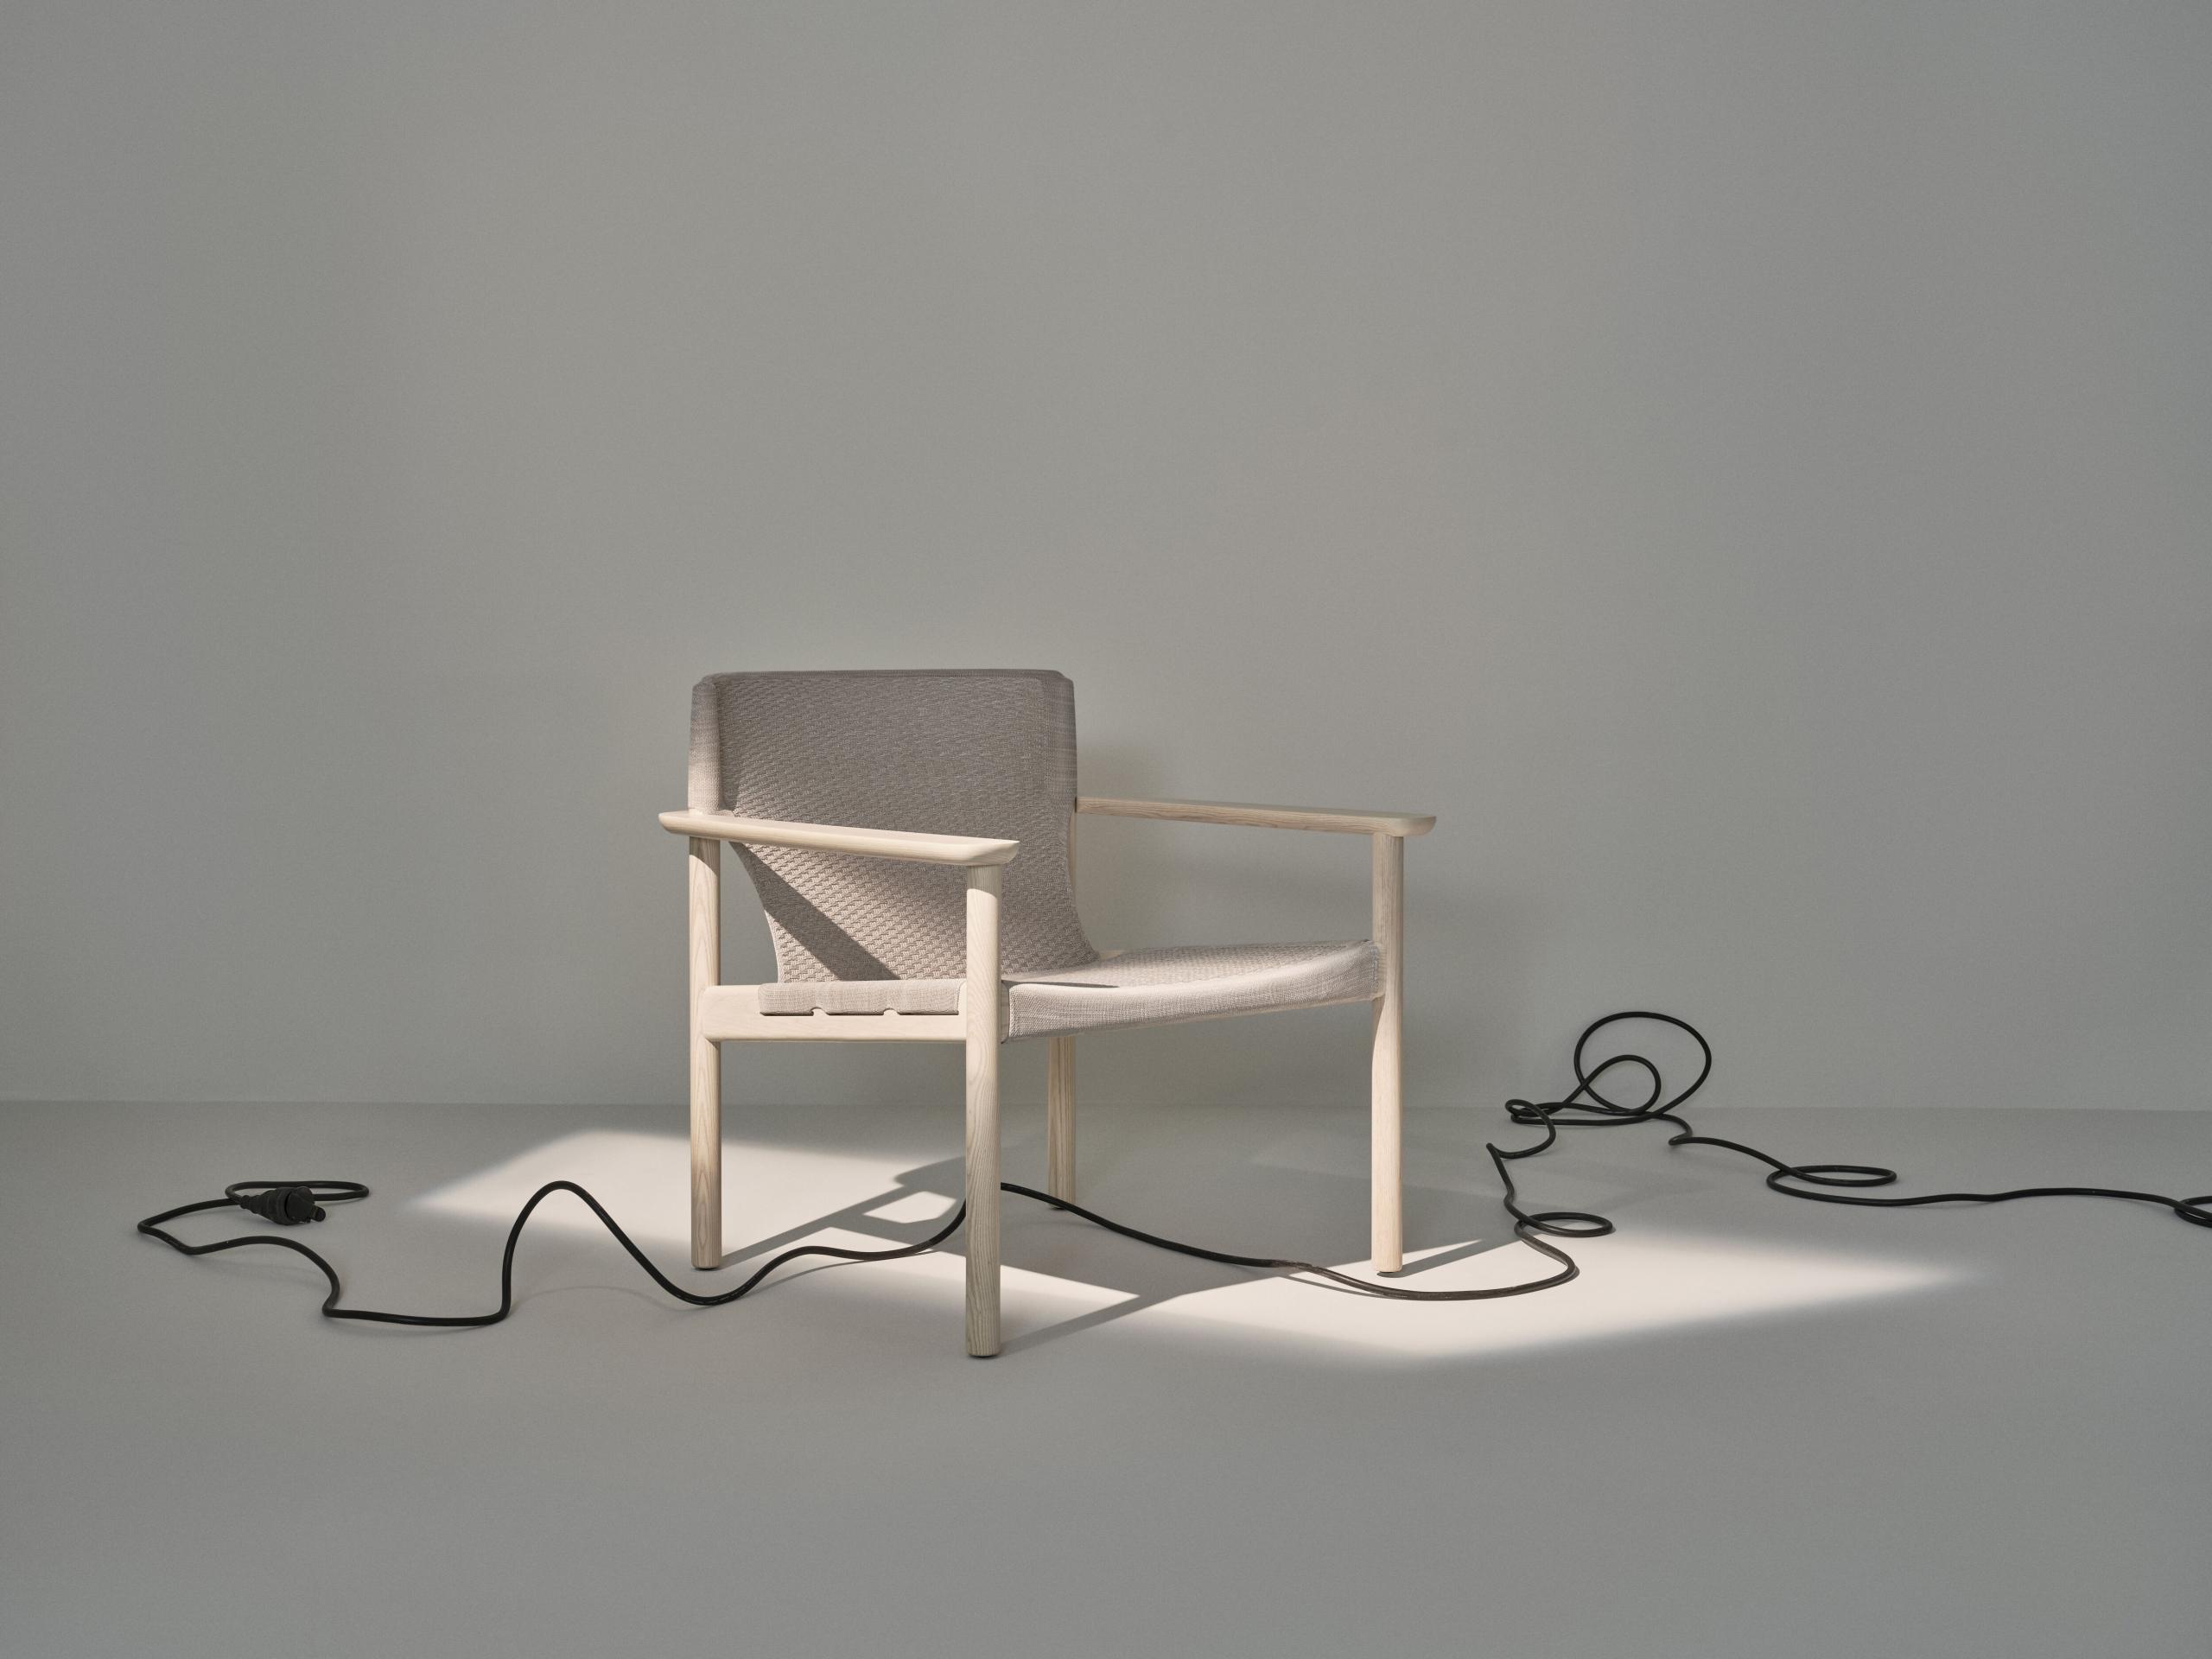 Evo Lounge chair product image 7